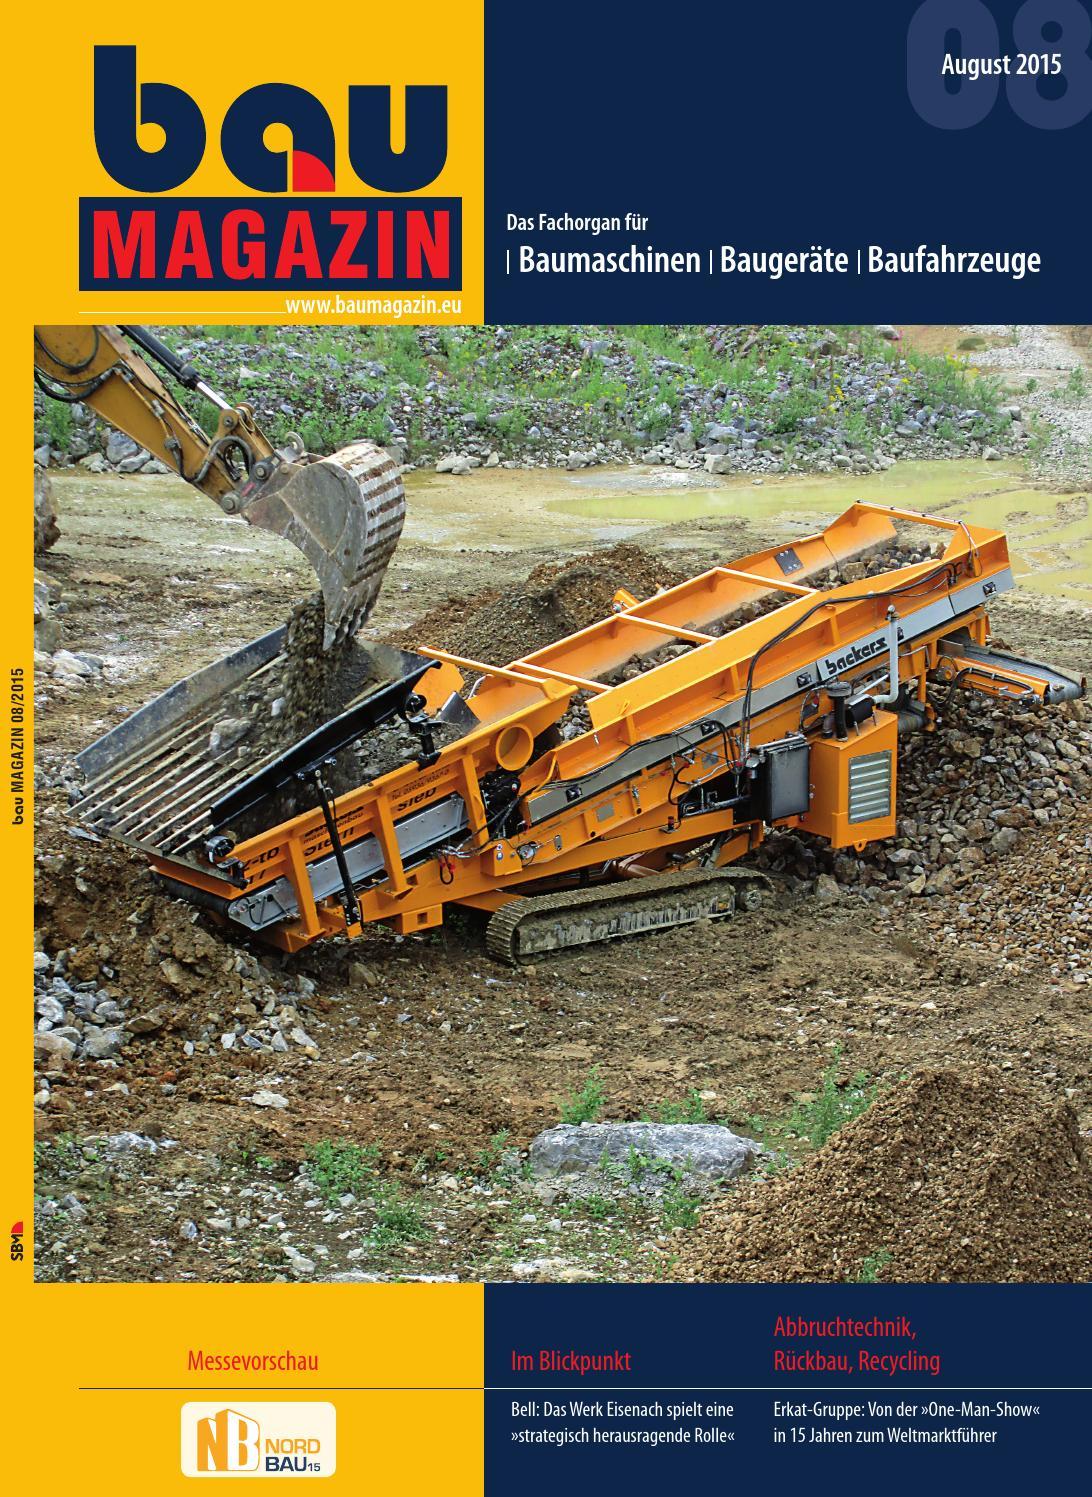 bauMAGAZIN August 2015 by SBM Verlag GmbH - issuu